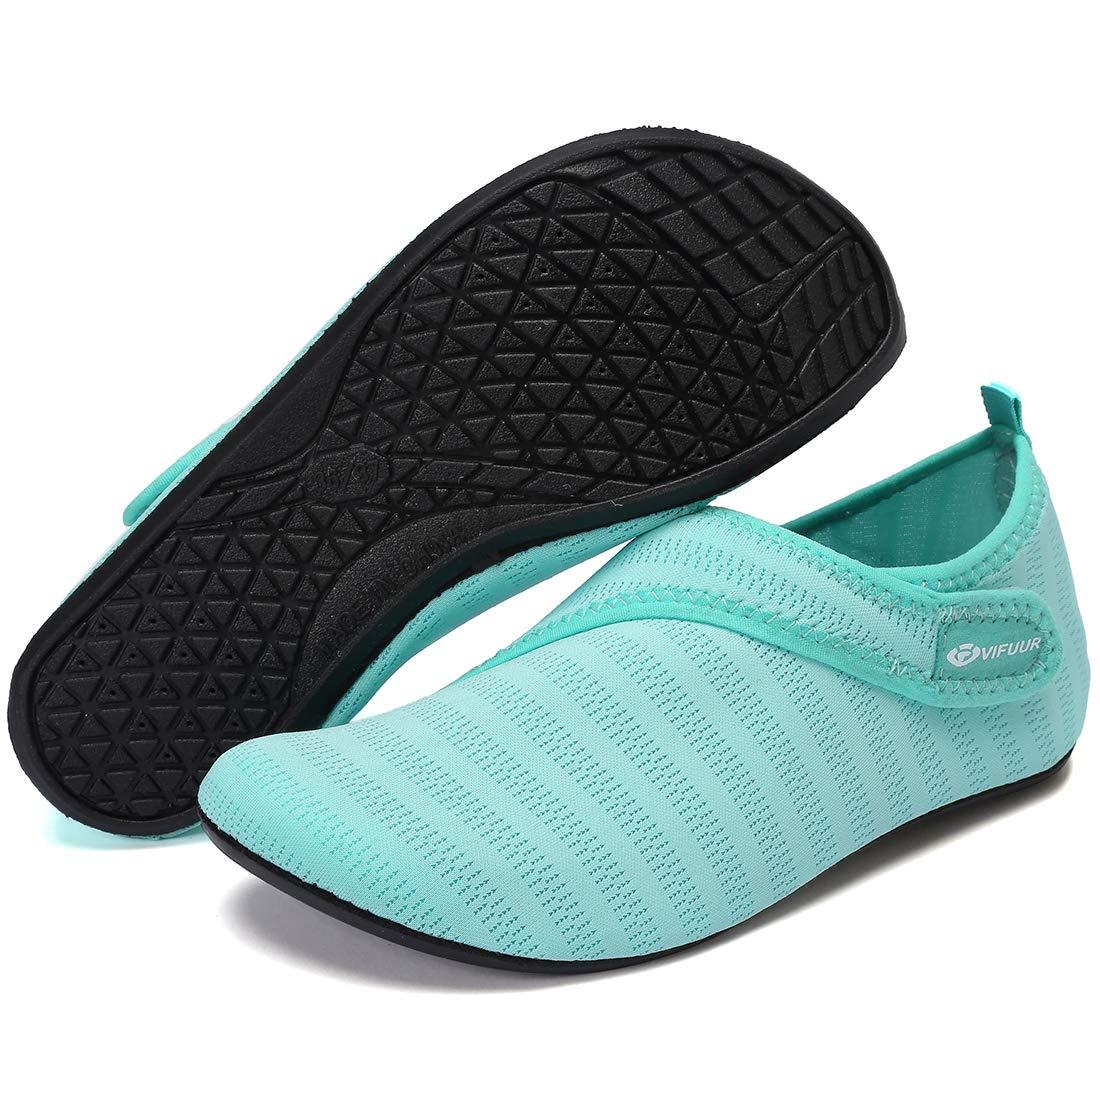 Surf Spiaggia Aqua Yoga VIFUUR Scarpe per Sport Acquatici in Mesh da Donna Regolabili per Outdoor da Uomo